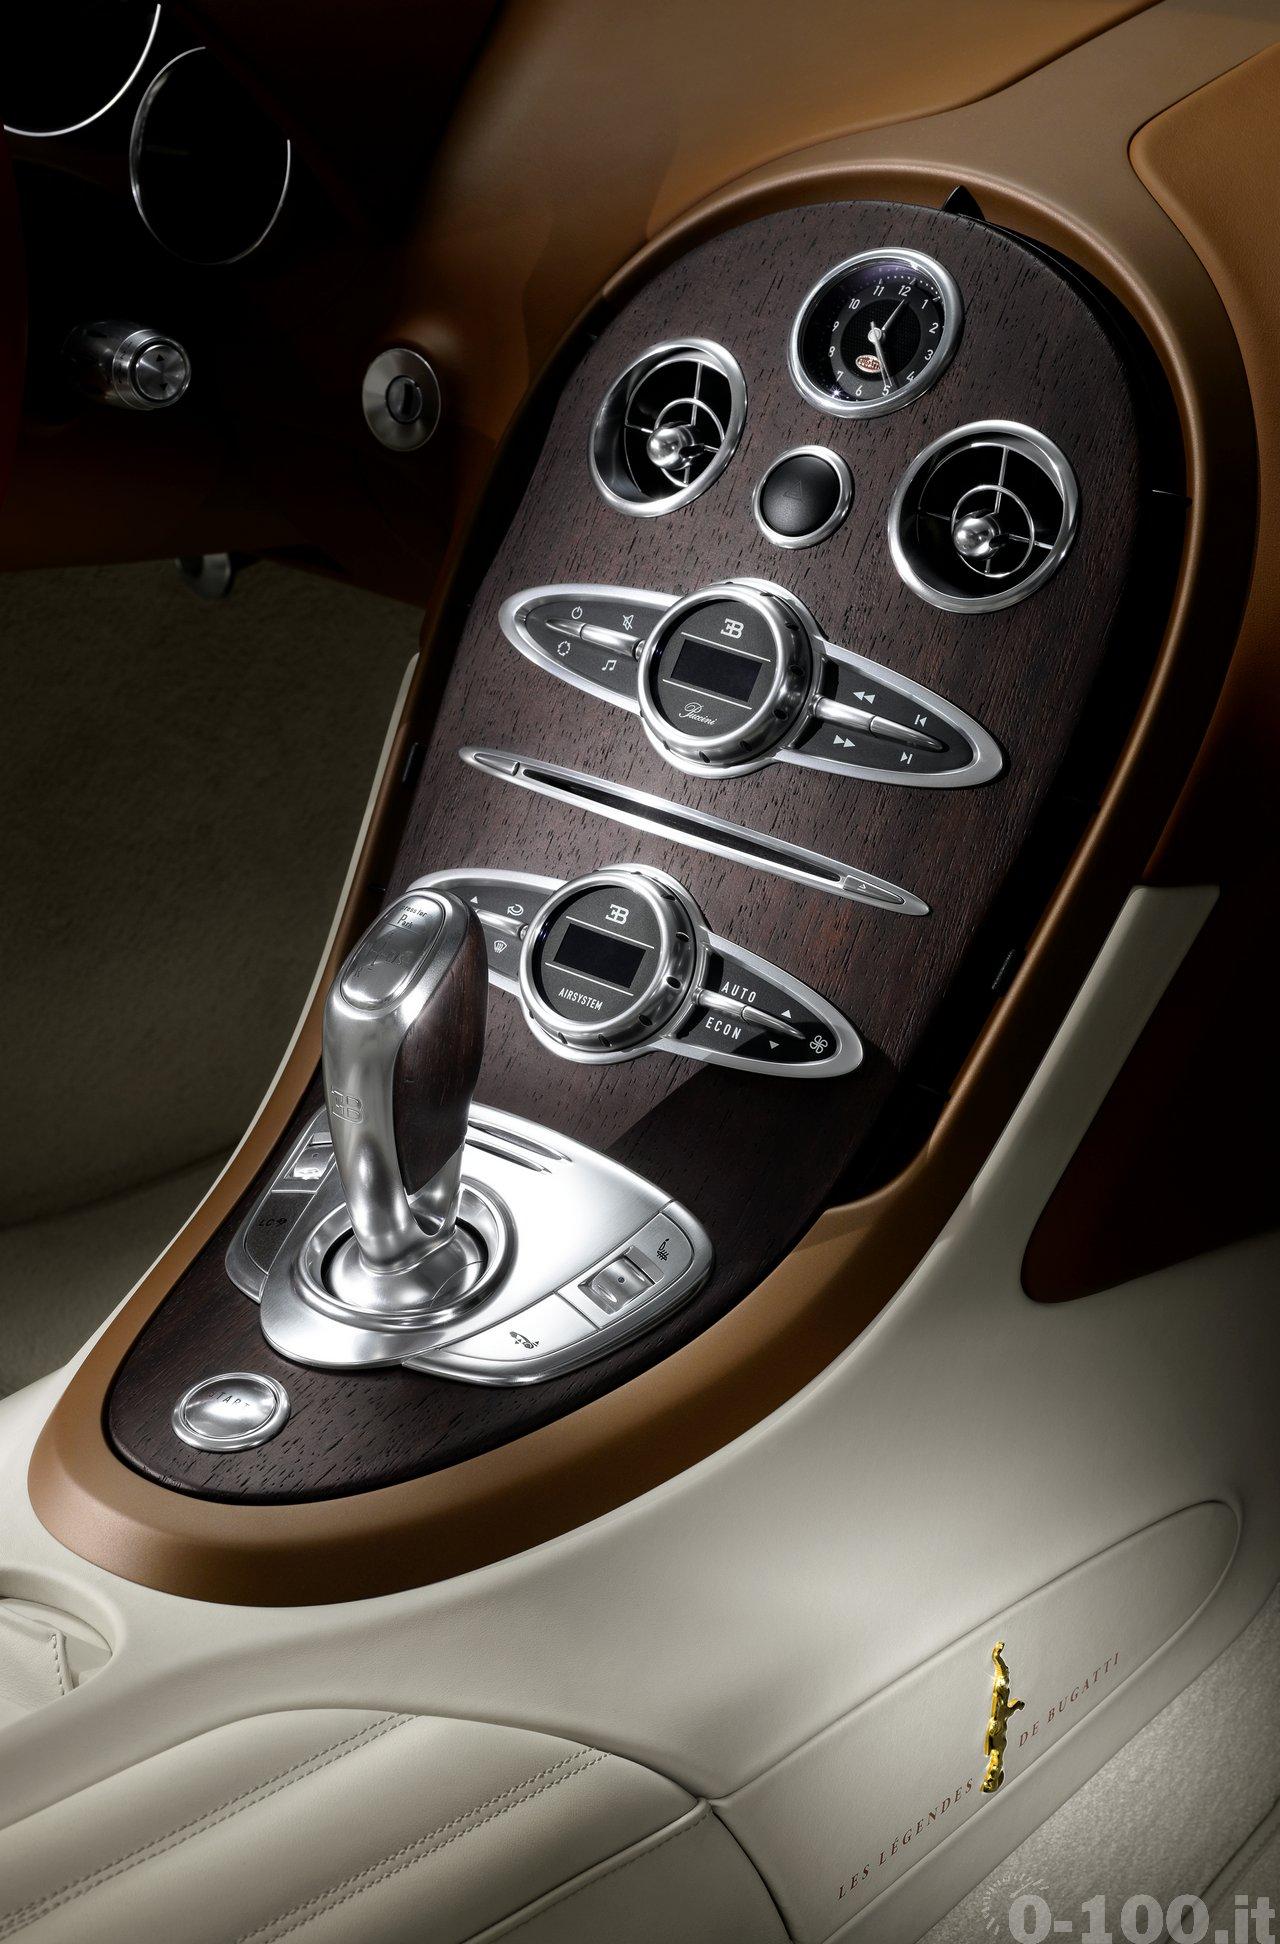 beijing-2014-bugatti-veyron-serie-speciale-les-legendes-de-bugatti-veyron-16-4-grand-sport-vitesse-black-bess_29